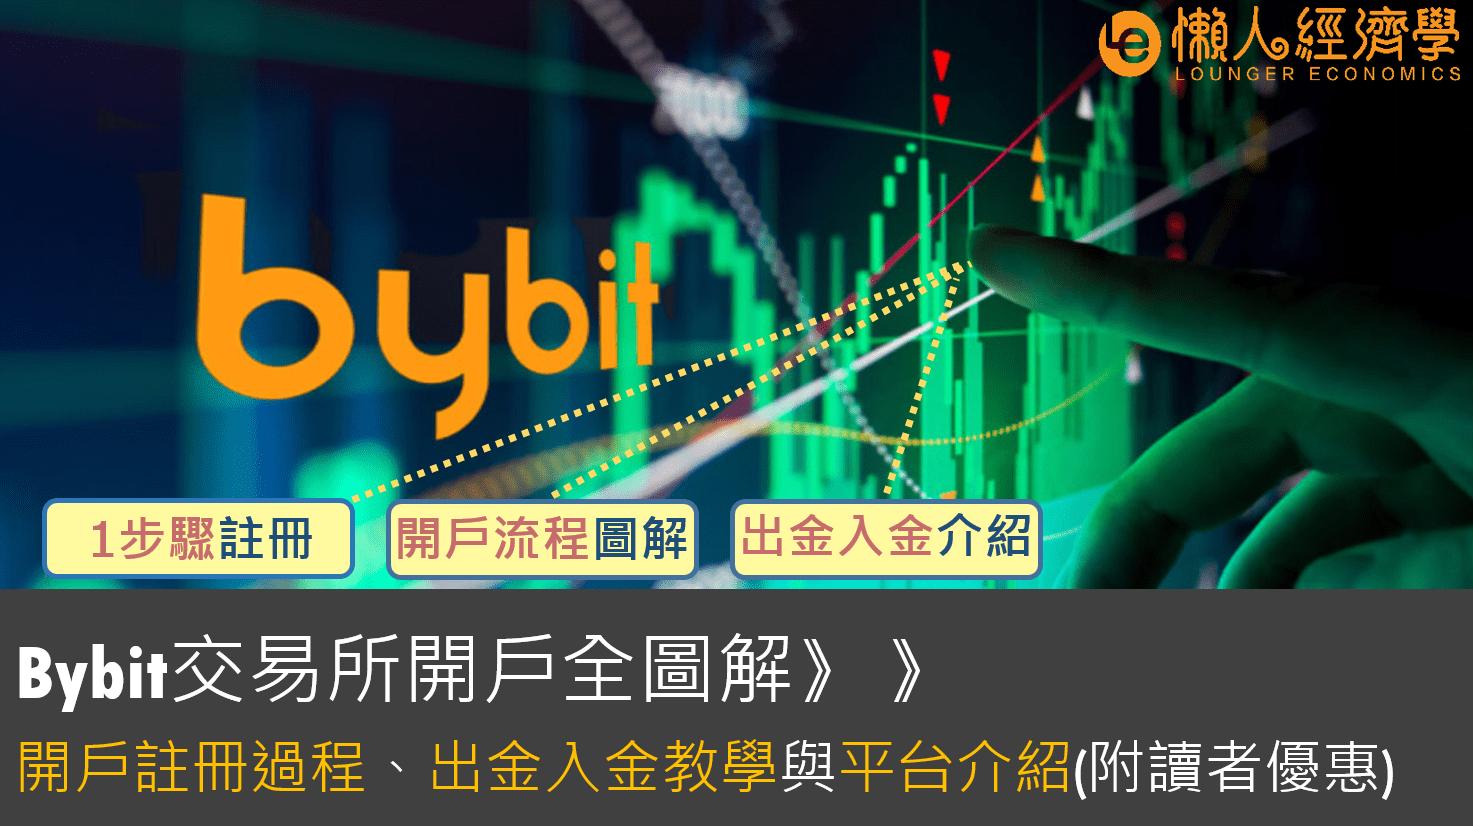 【Bybit交易所開戶】Bybit 開戶、出金入金教學:1步驟註冊圖解、身份驗證流程、客服實測